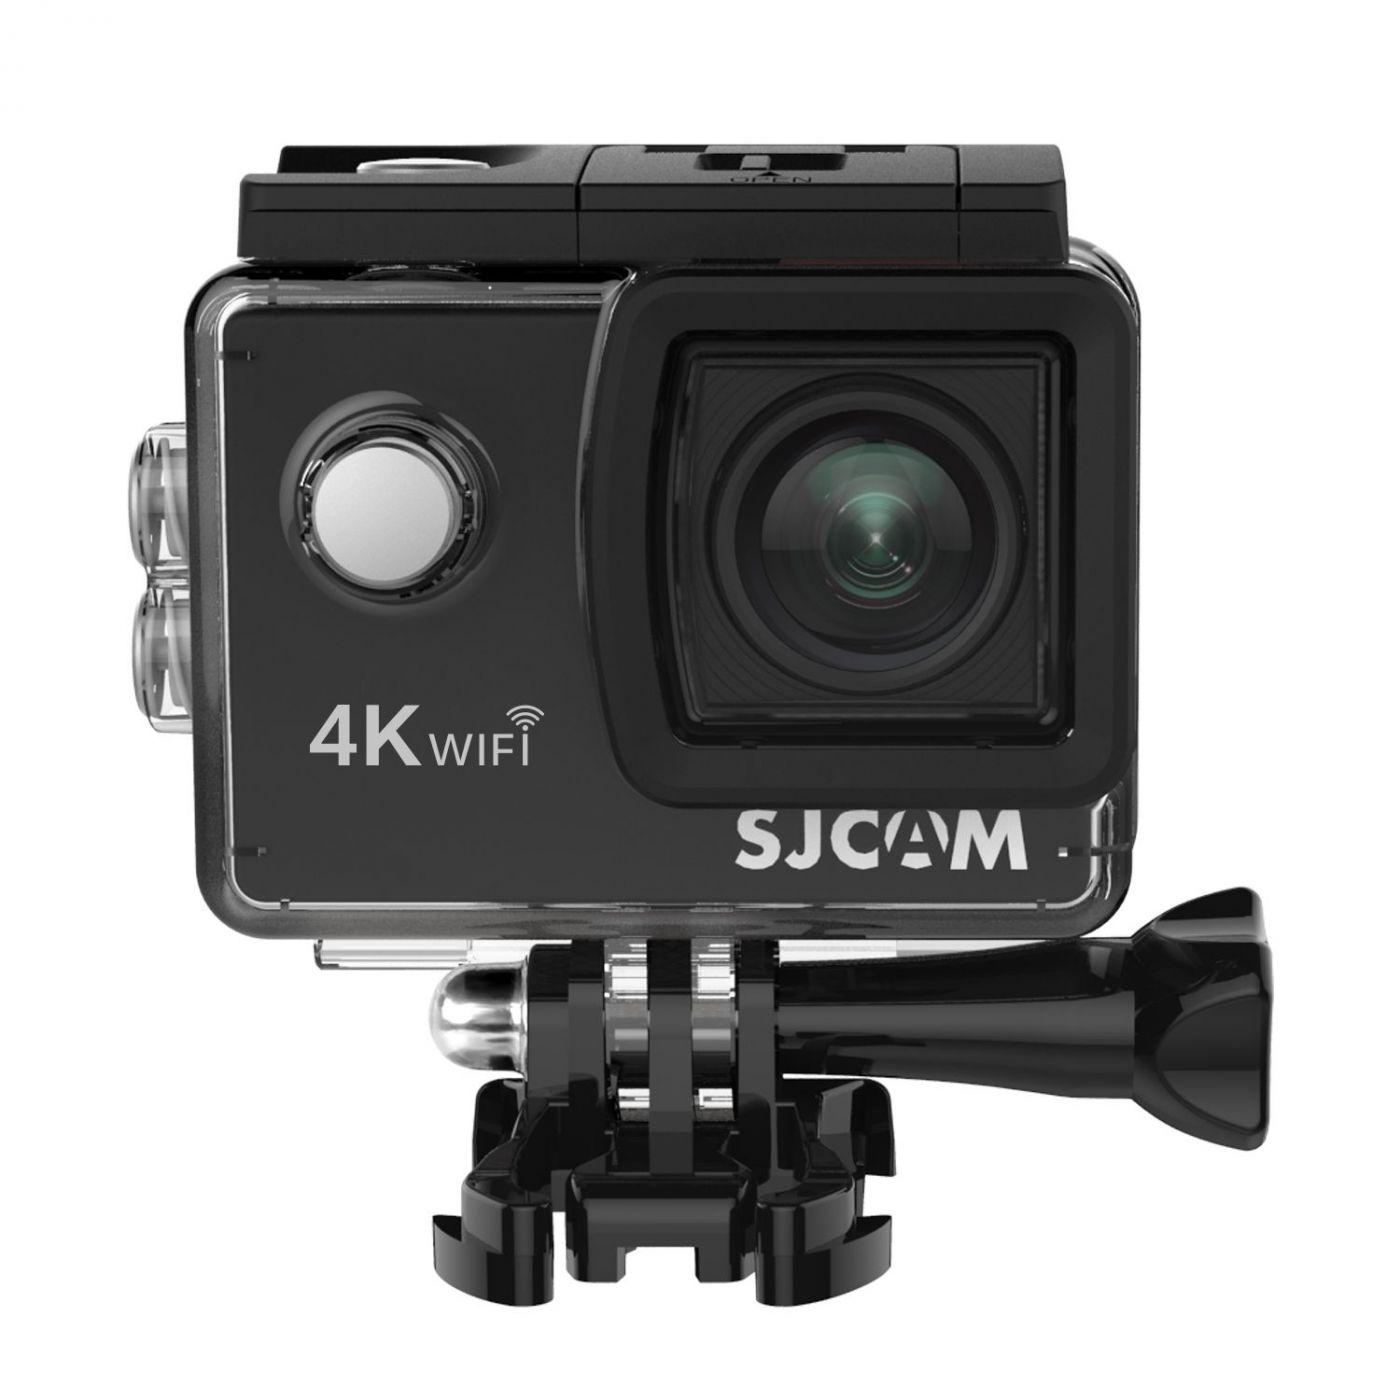 Экшн-камера SJCAM SJ4000 Air черная